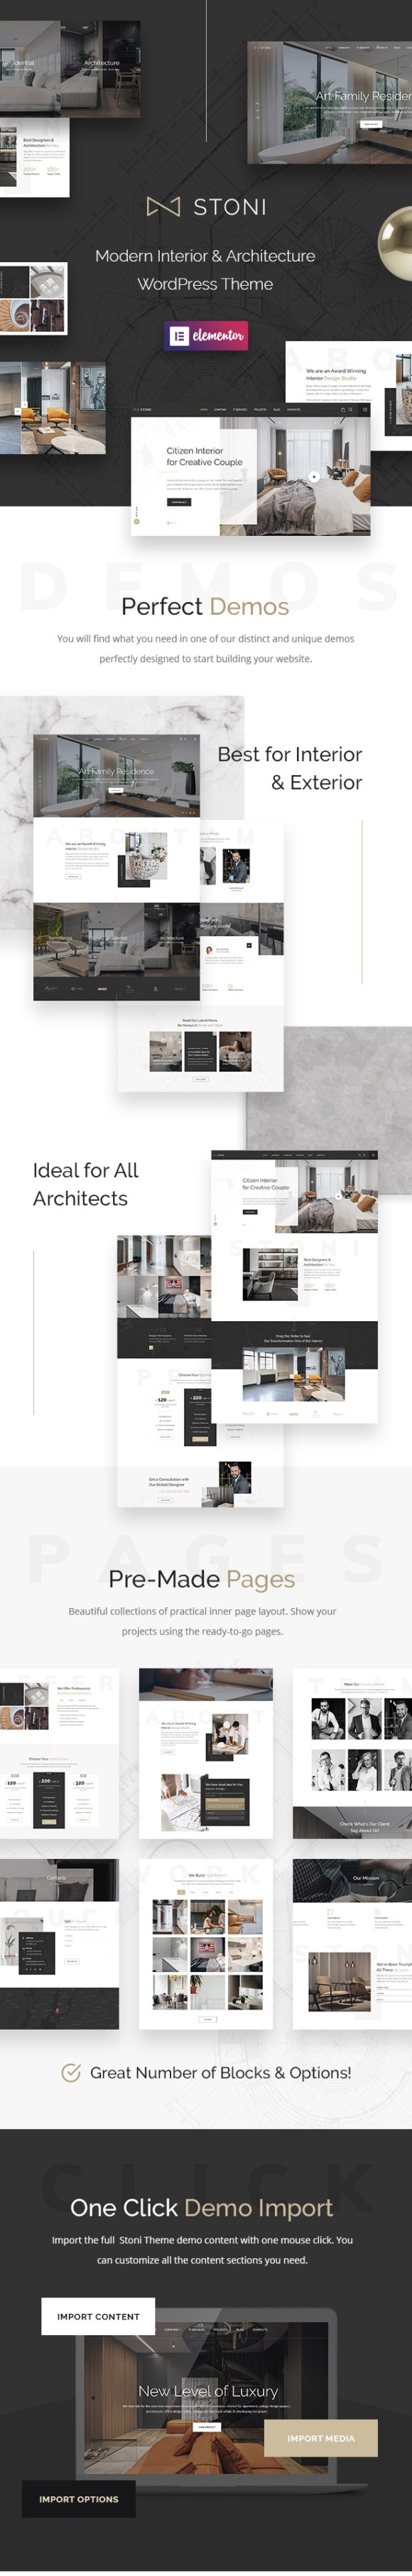 Stoni - Architecture Agency WordPress Theme - 1